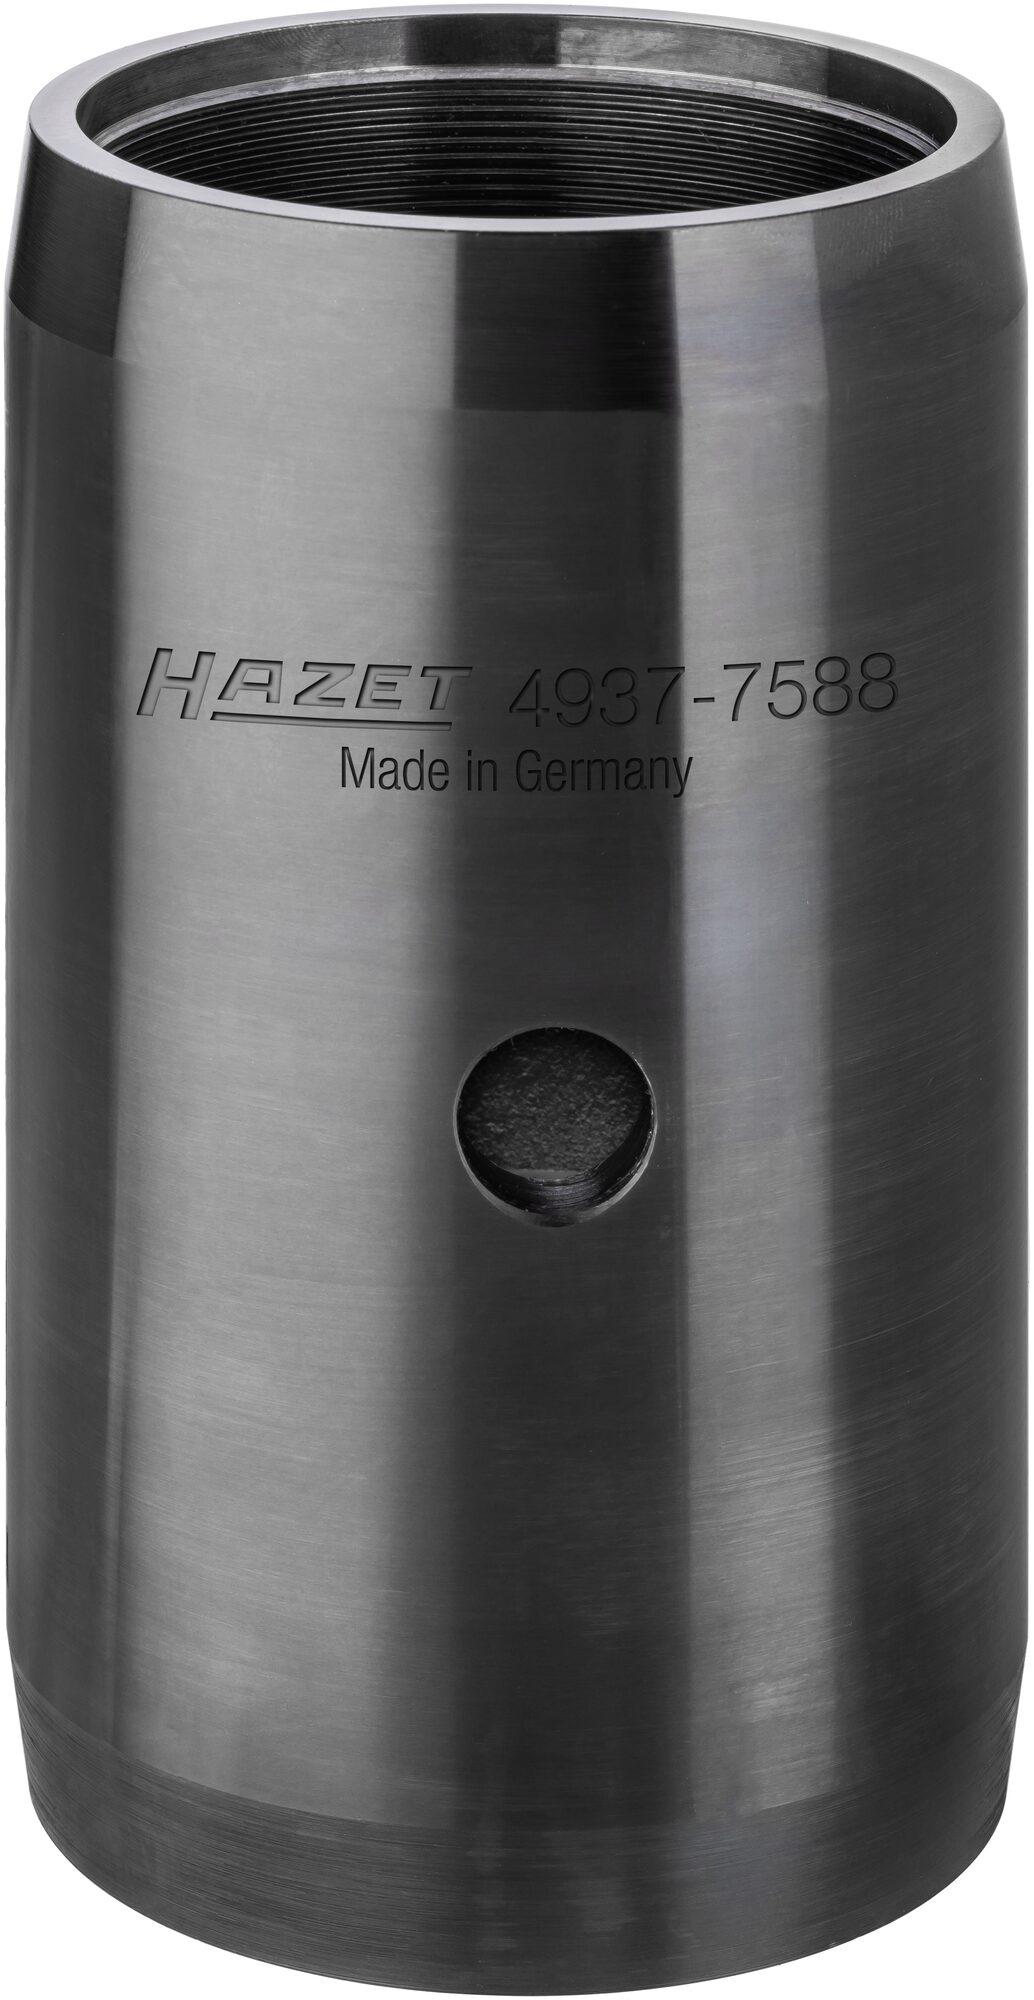 HAZET Nkw Montagehülse SAF – Gewinde M75x1,5 rechts/ links 4937-7588 ∙ 88 mm